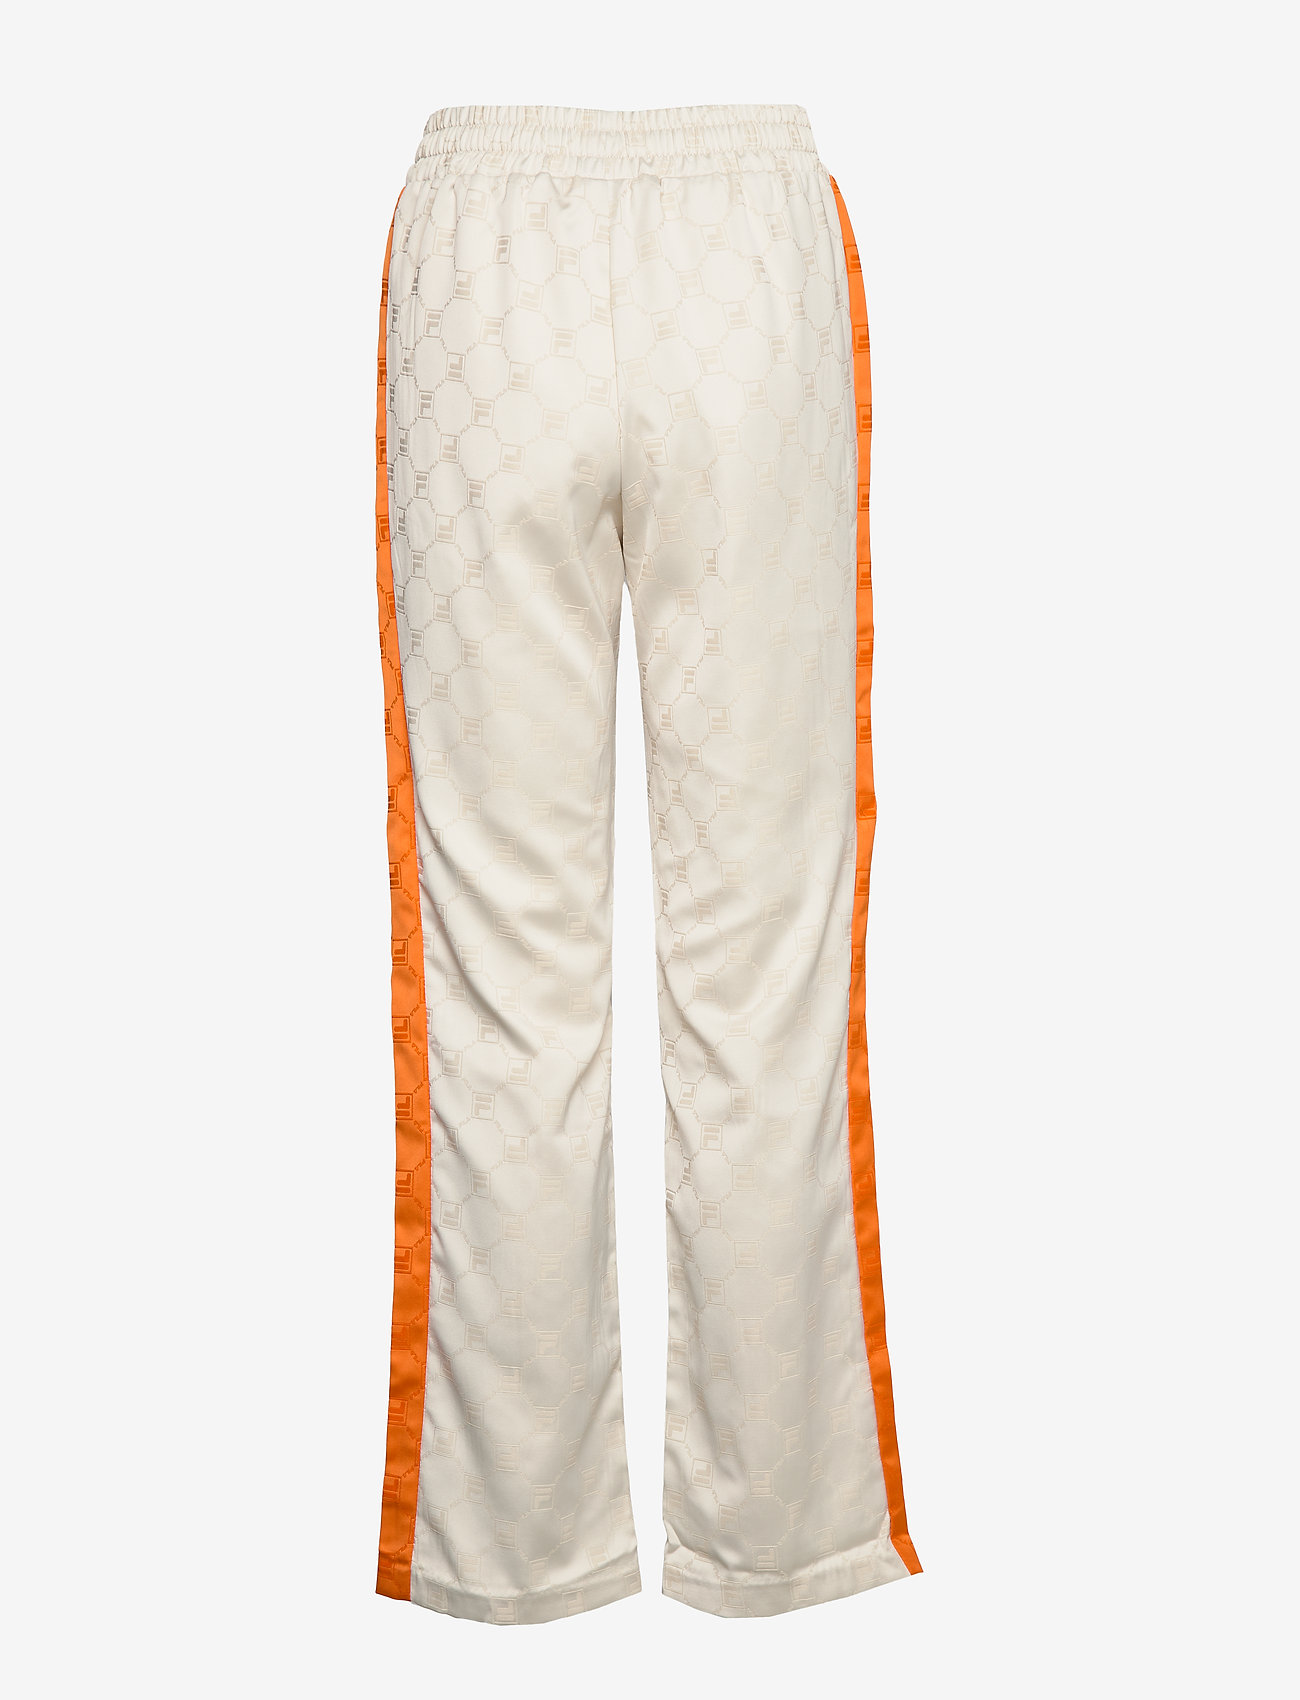 Women Halle Satin Track Pants (Eggnog-mandarin Orange) - FILA wytxBb